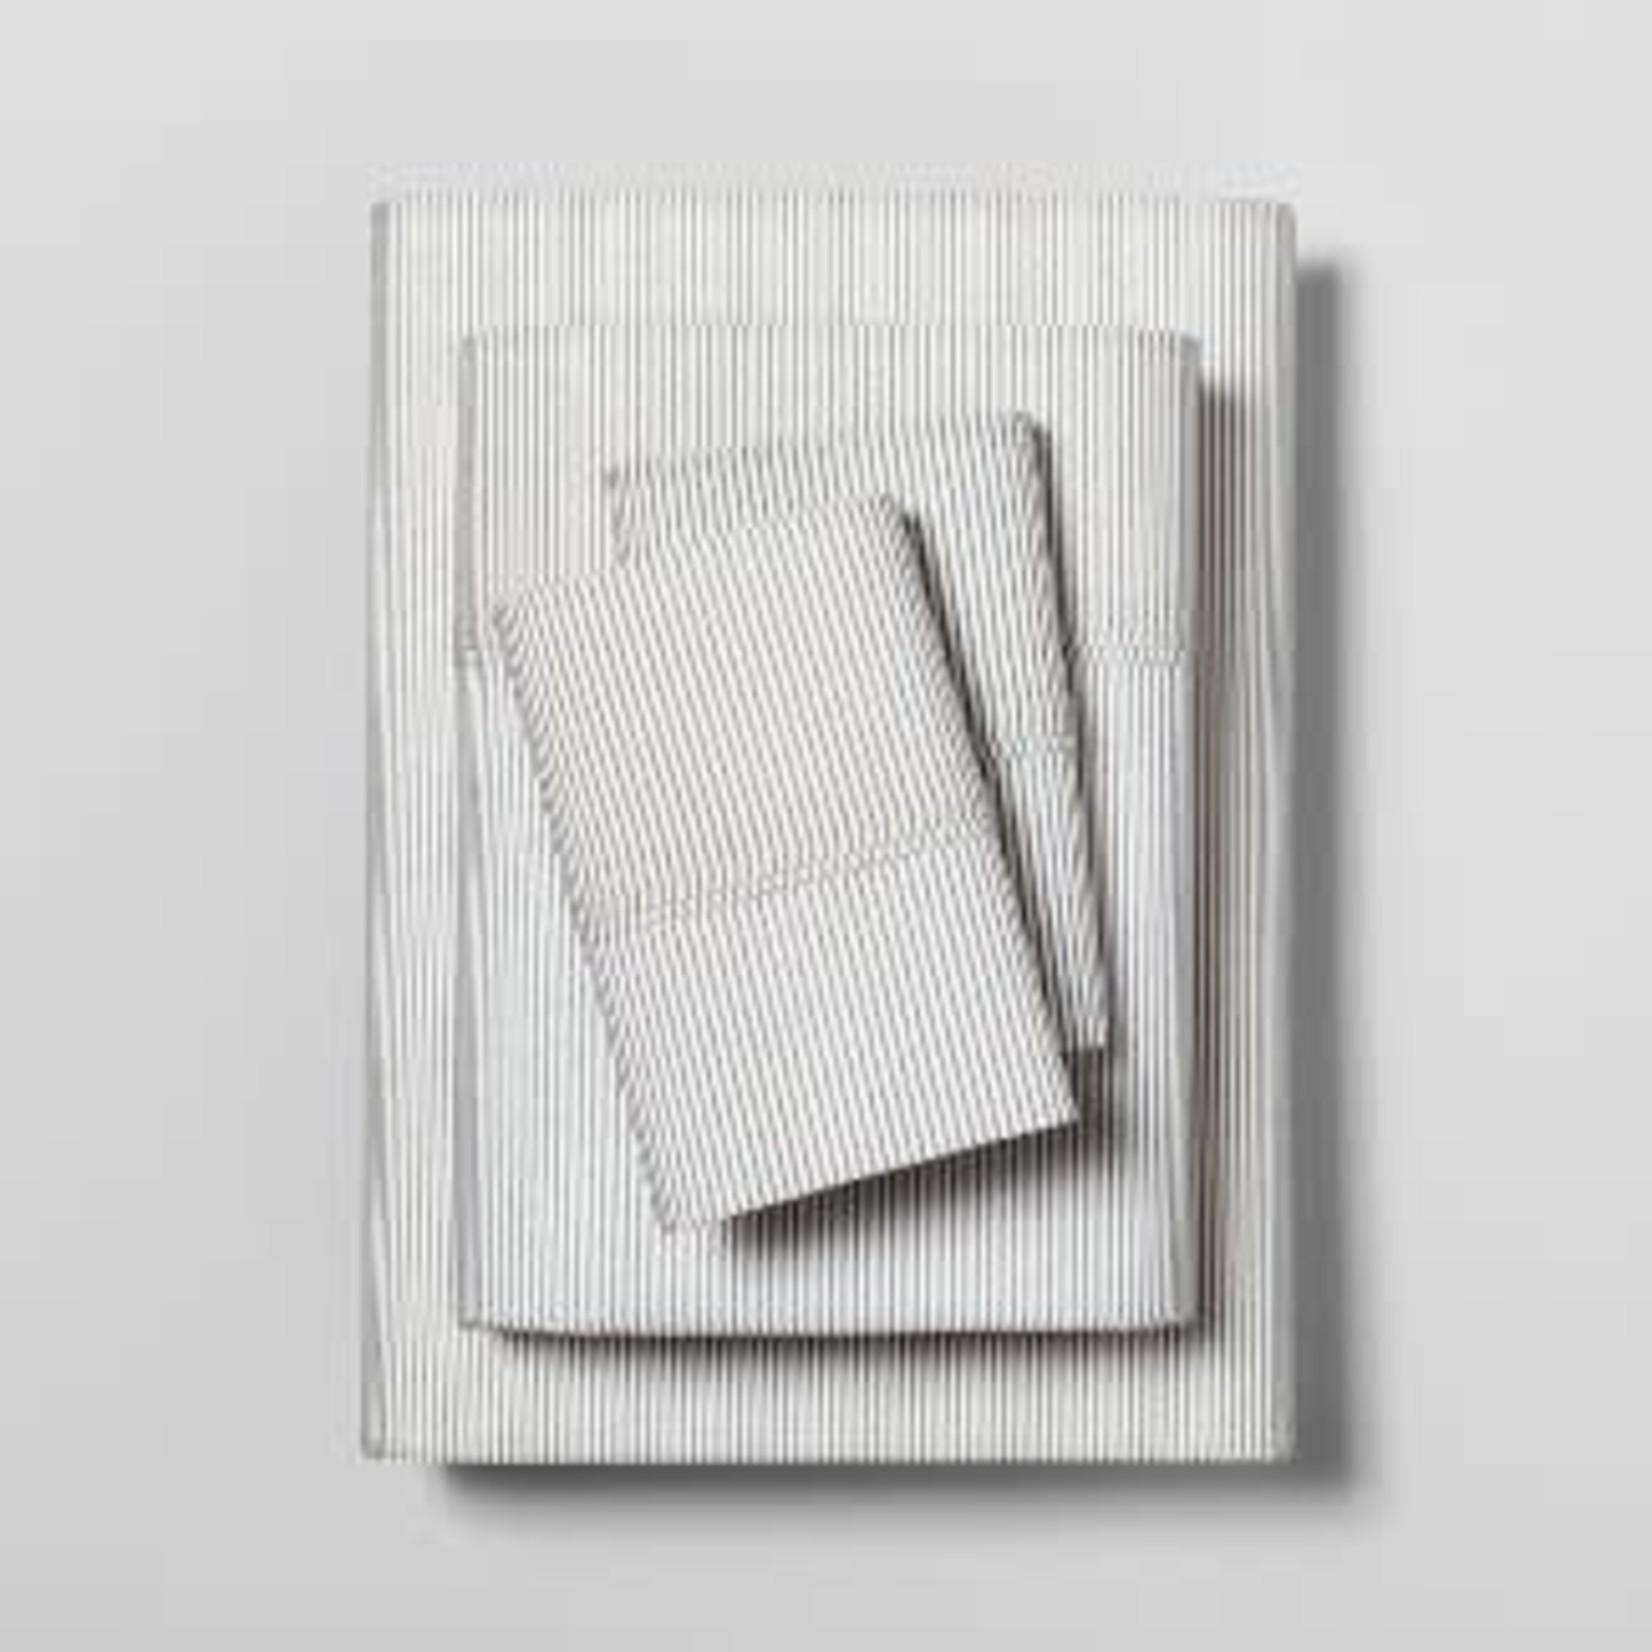 Hearth & Hand™ with Magnolia   Microstripe Printed Organic Sheet Set -KING